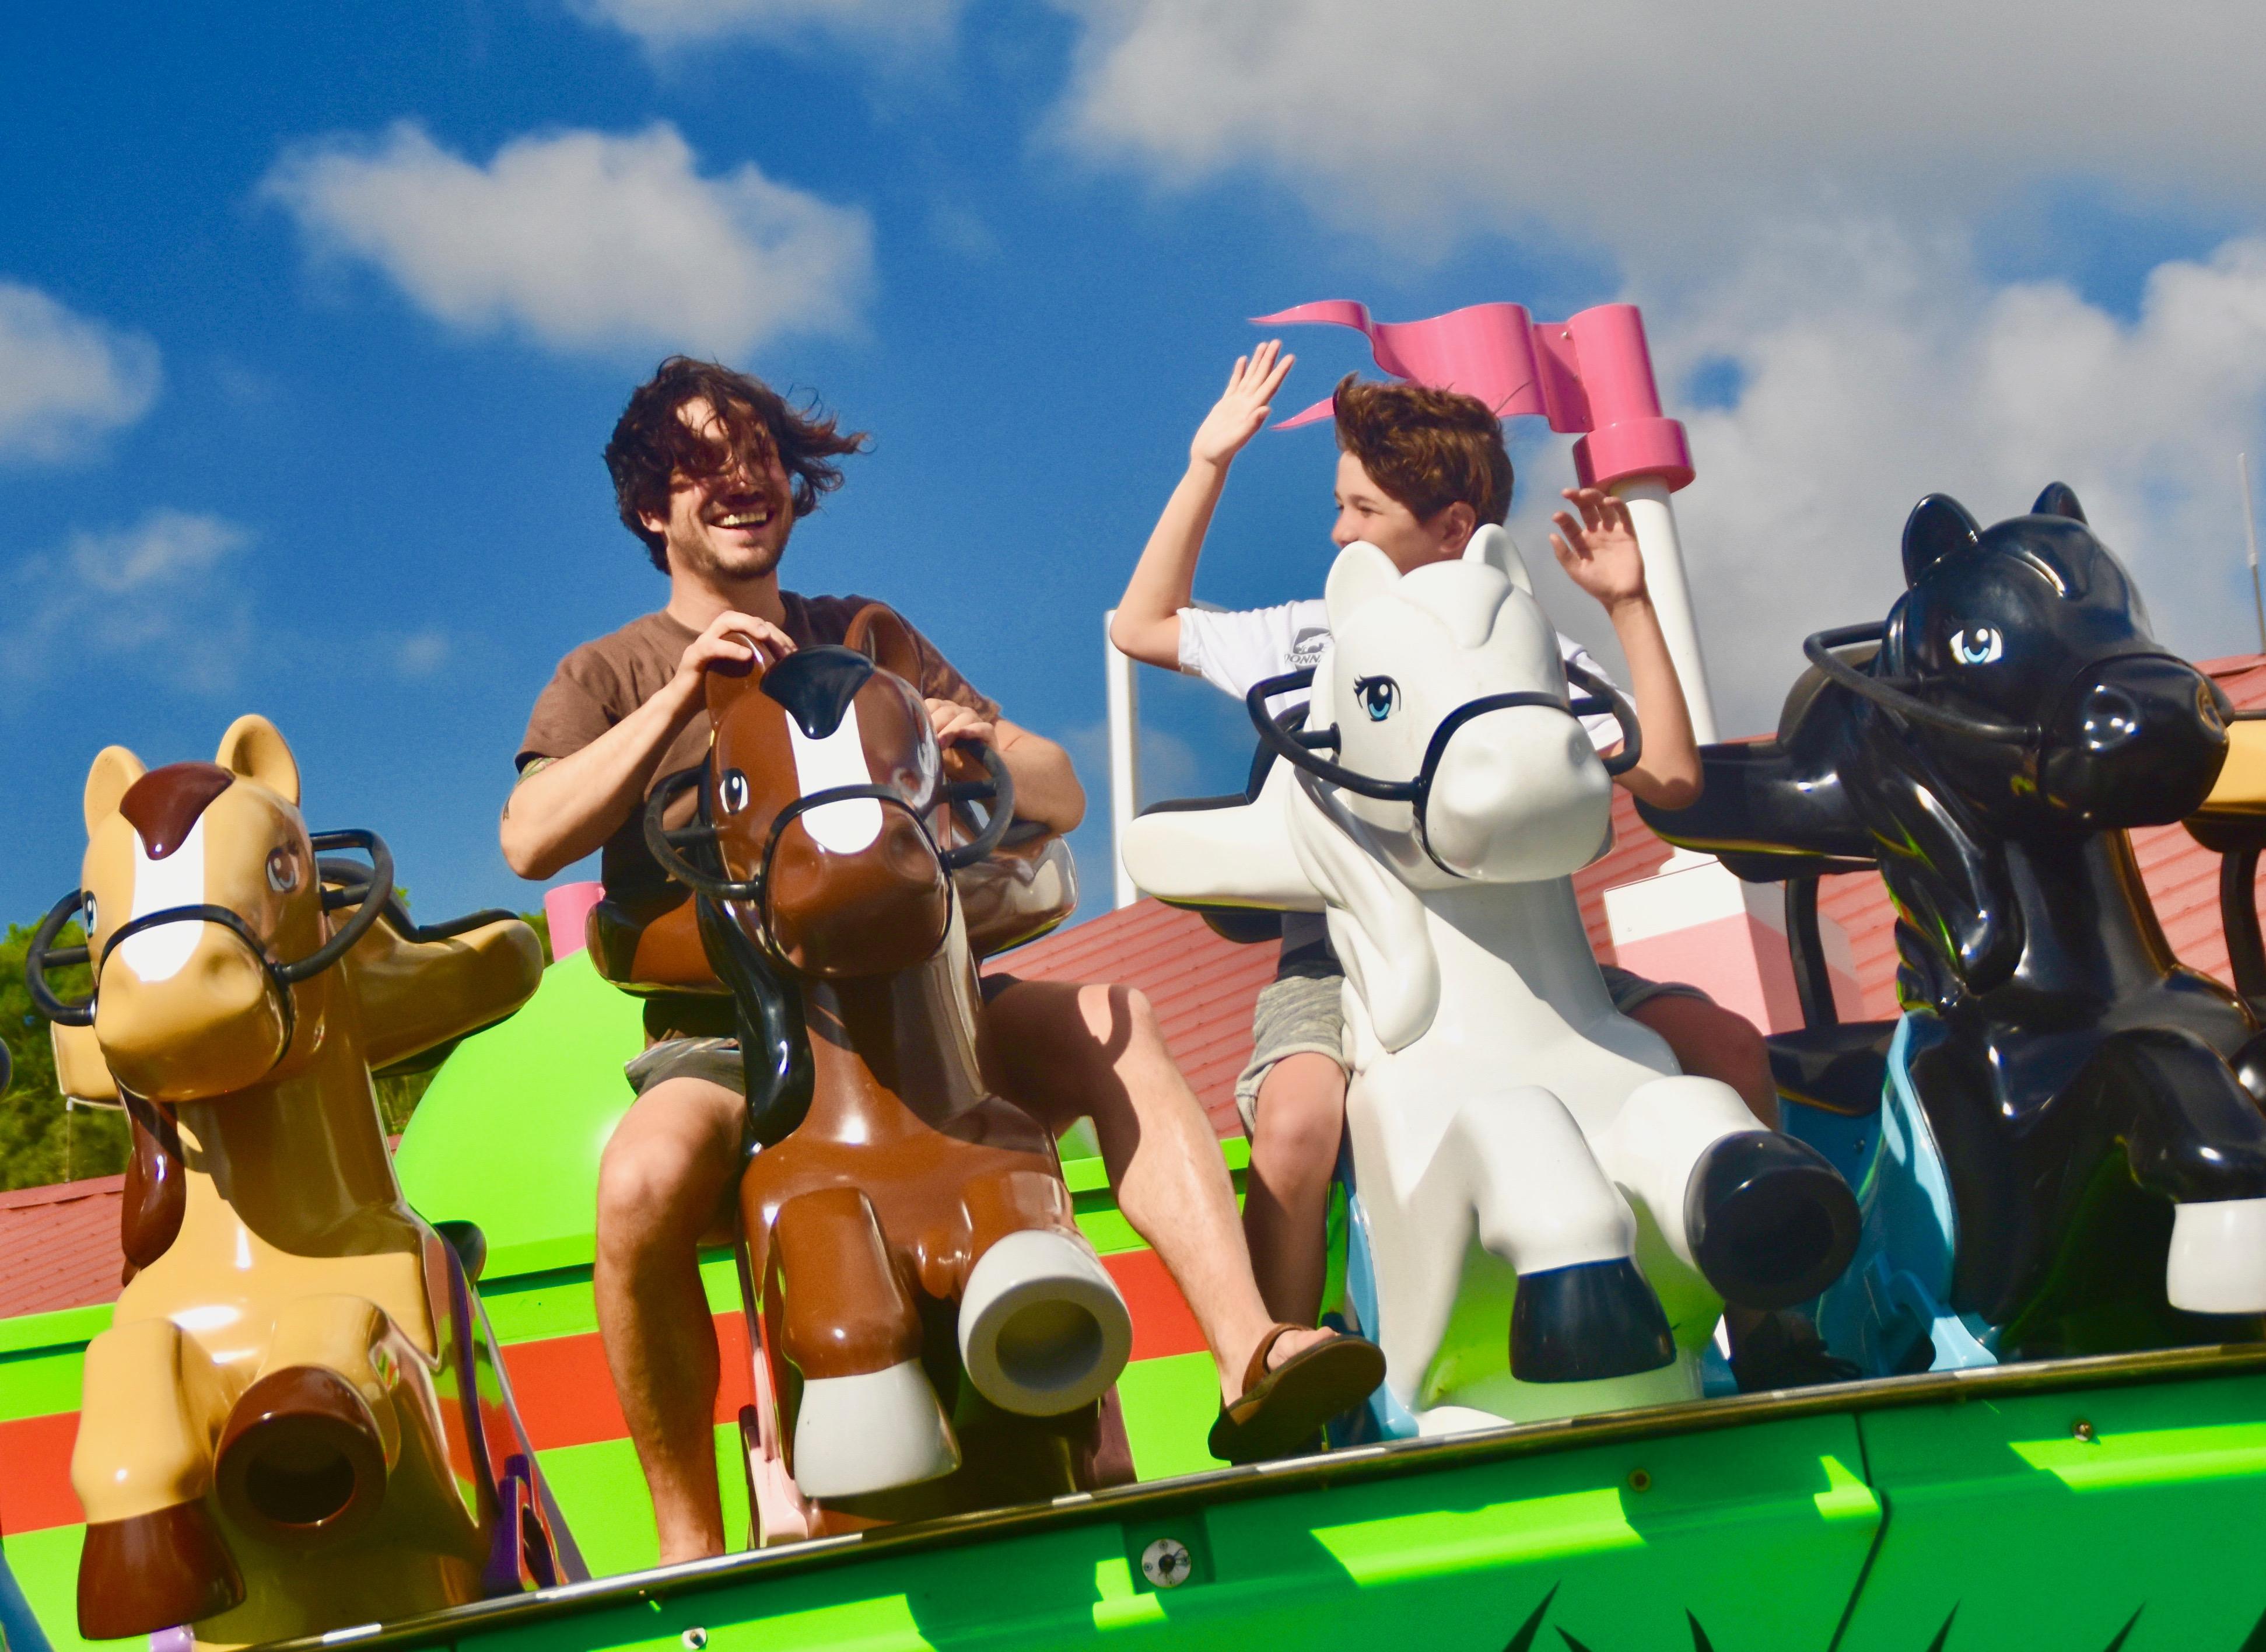 On Mia's Riding Adventure, Legoland Florida